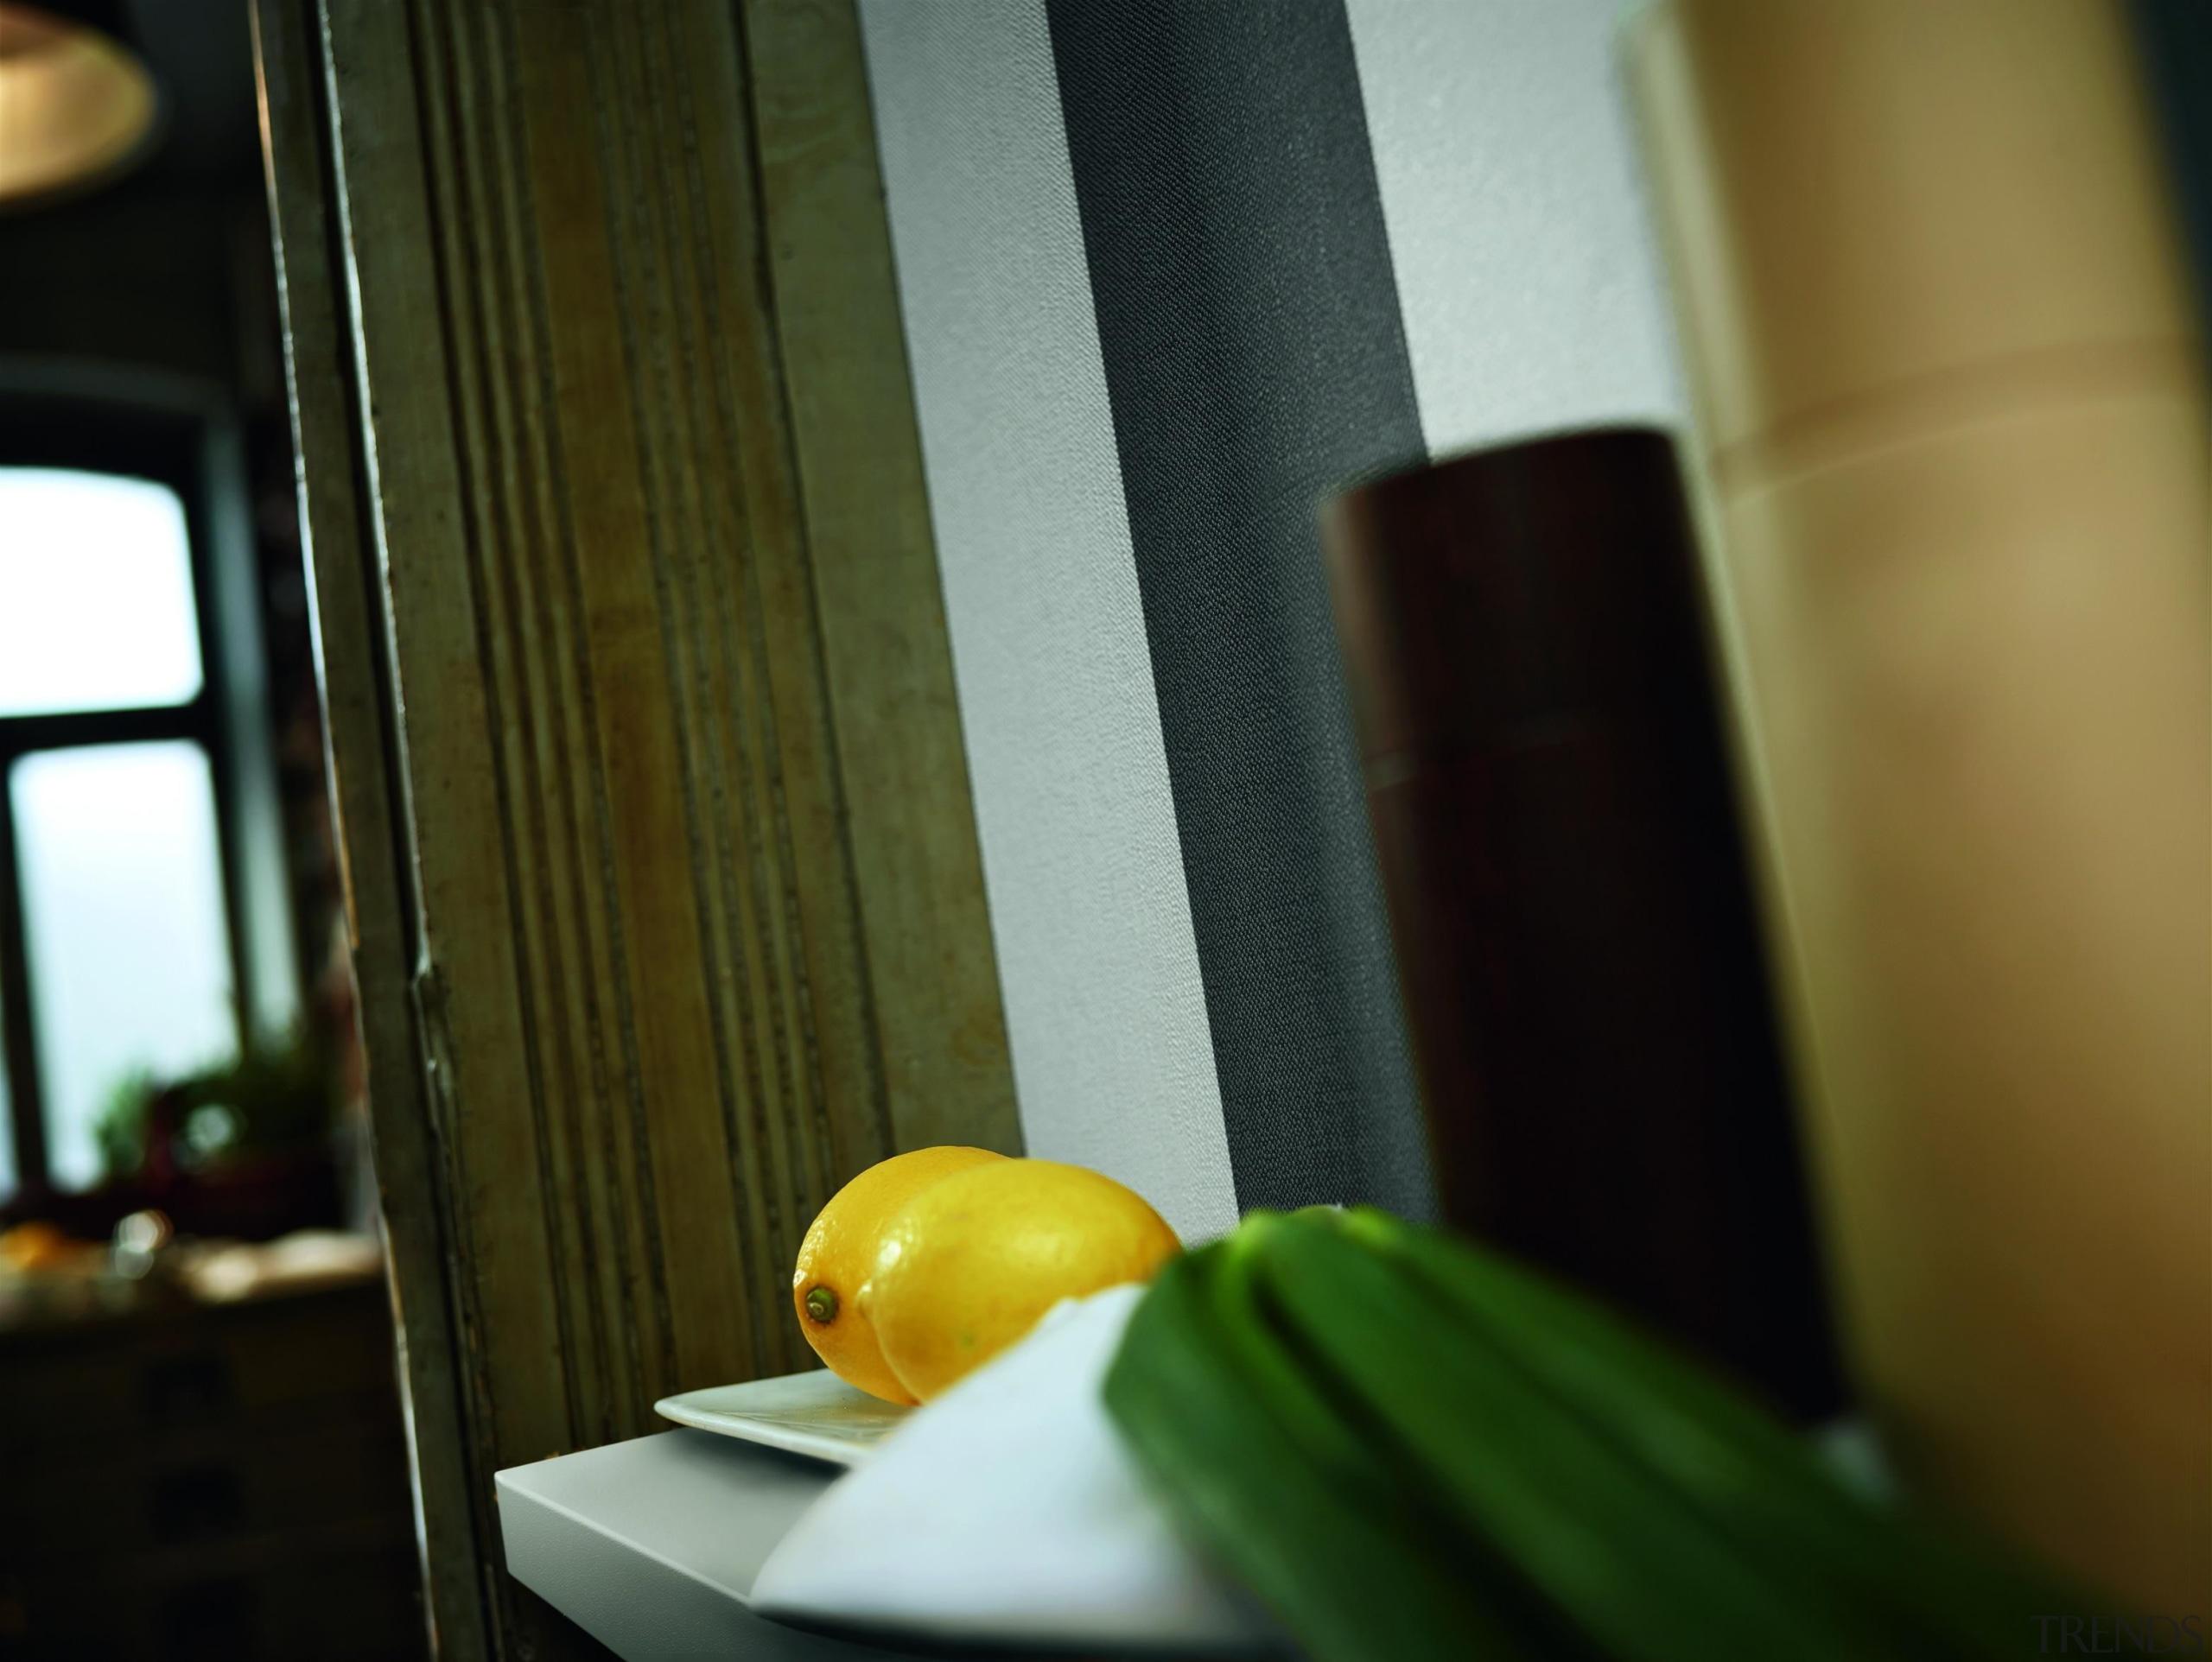 Elegance II Range - Elegance II Range - interior design, sunlight, wood, yellow, brown